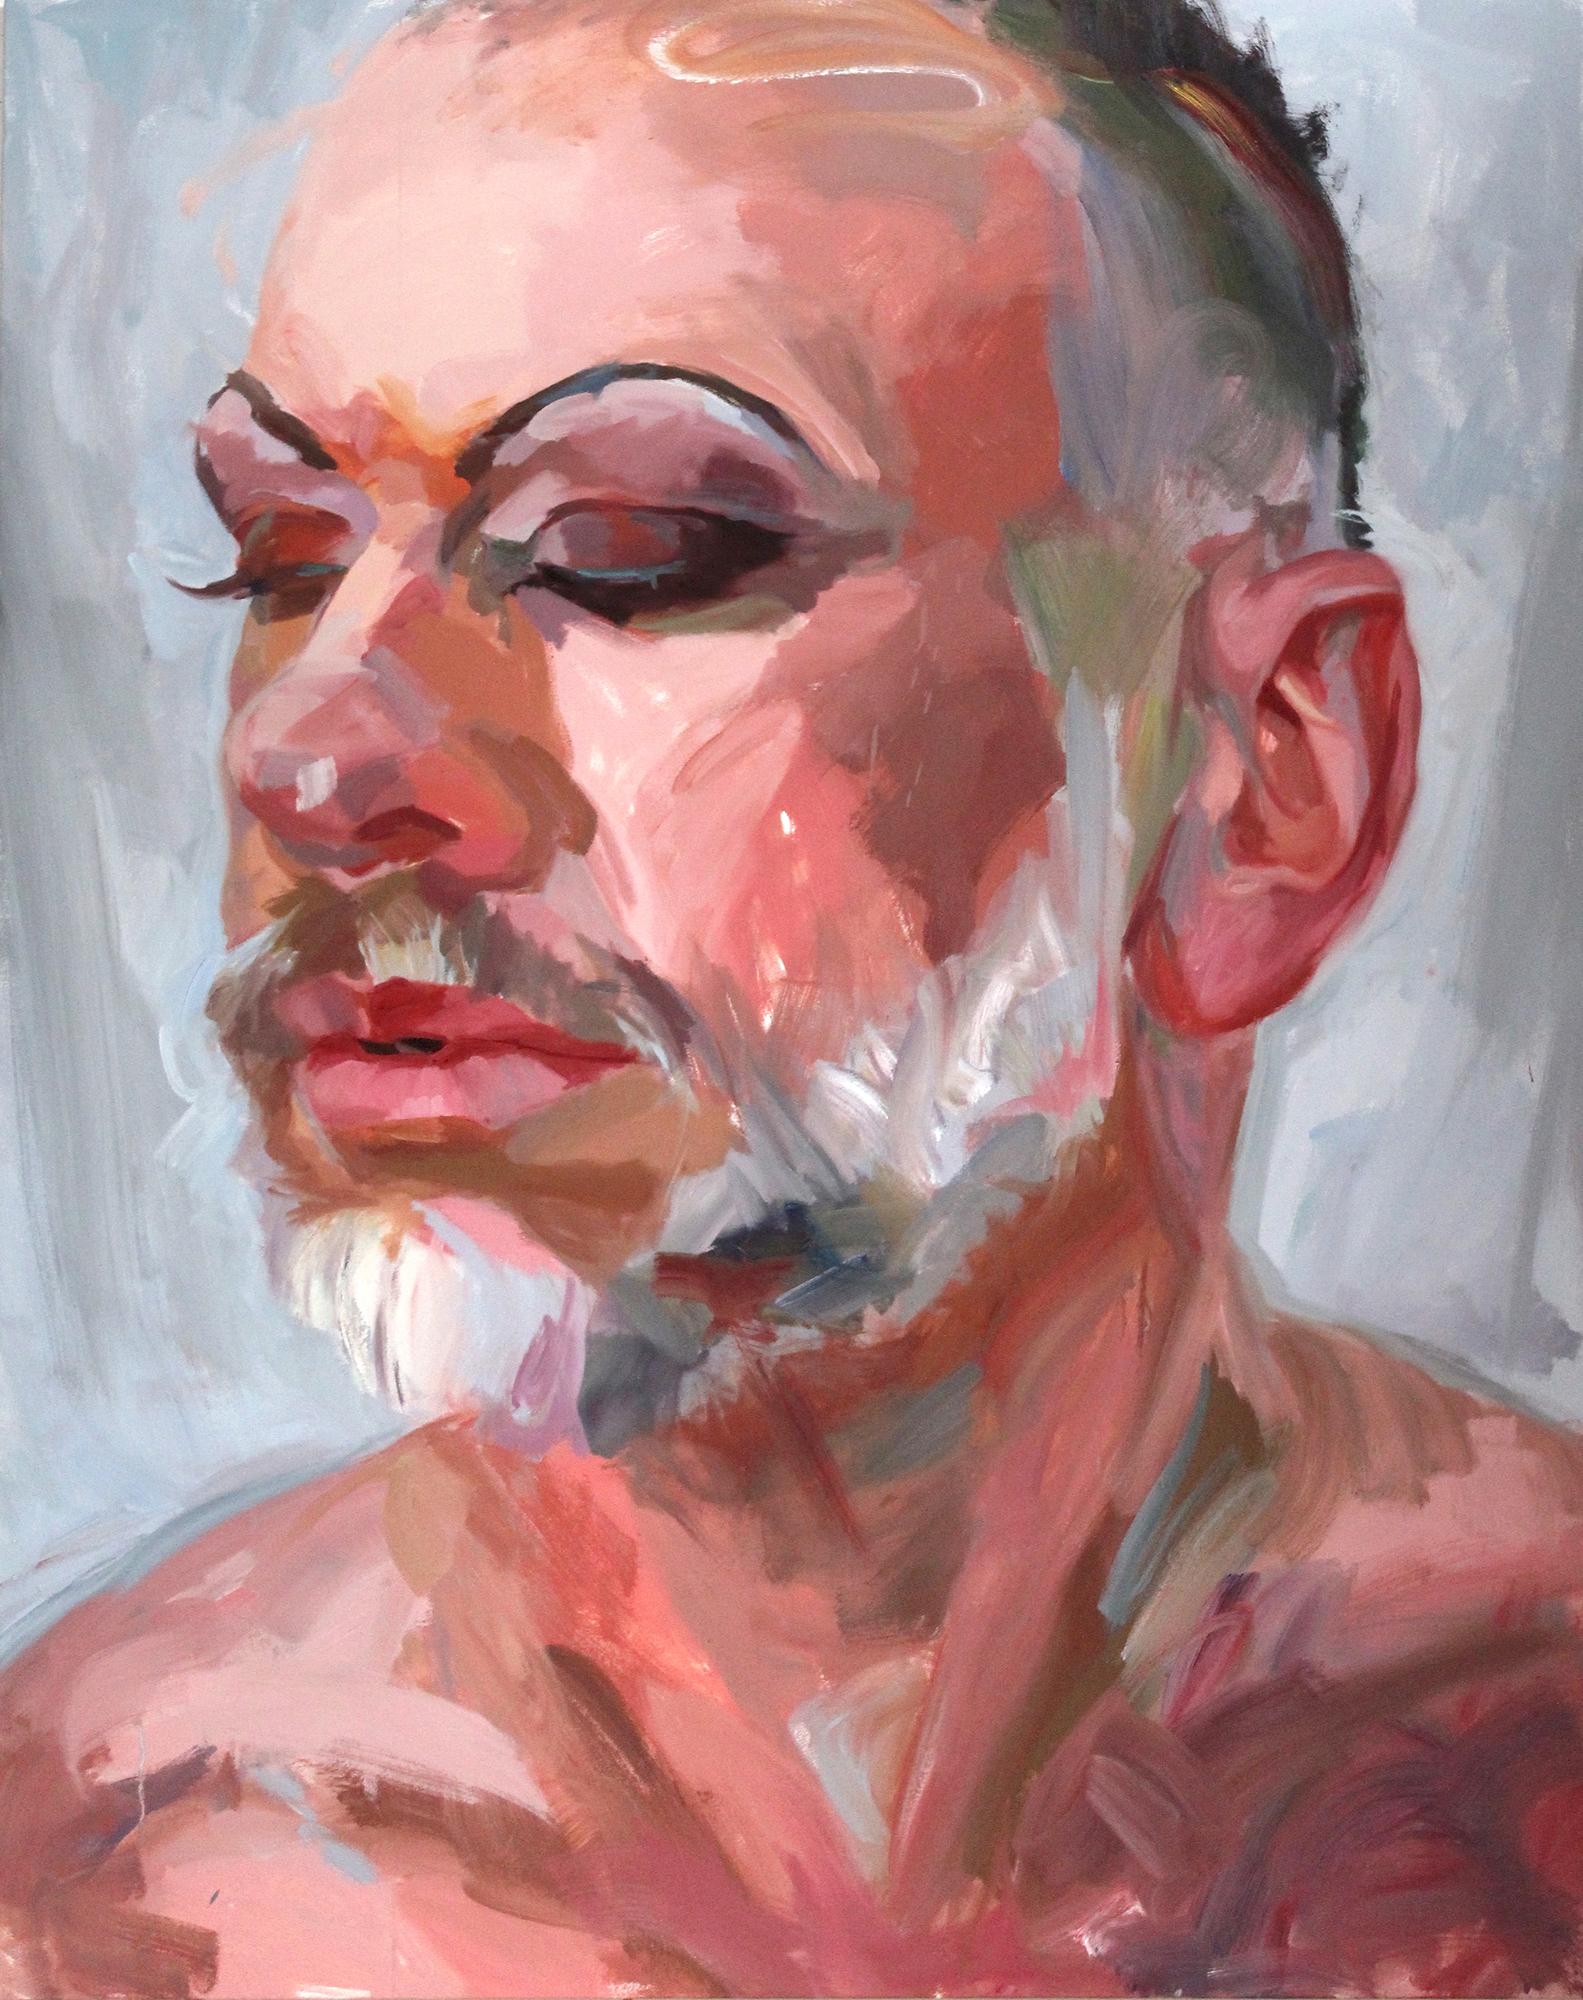 "Sleeping Beauty - 60"" x 48"" oil on canvas$12,500"